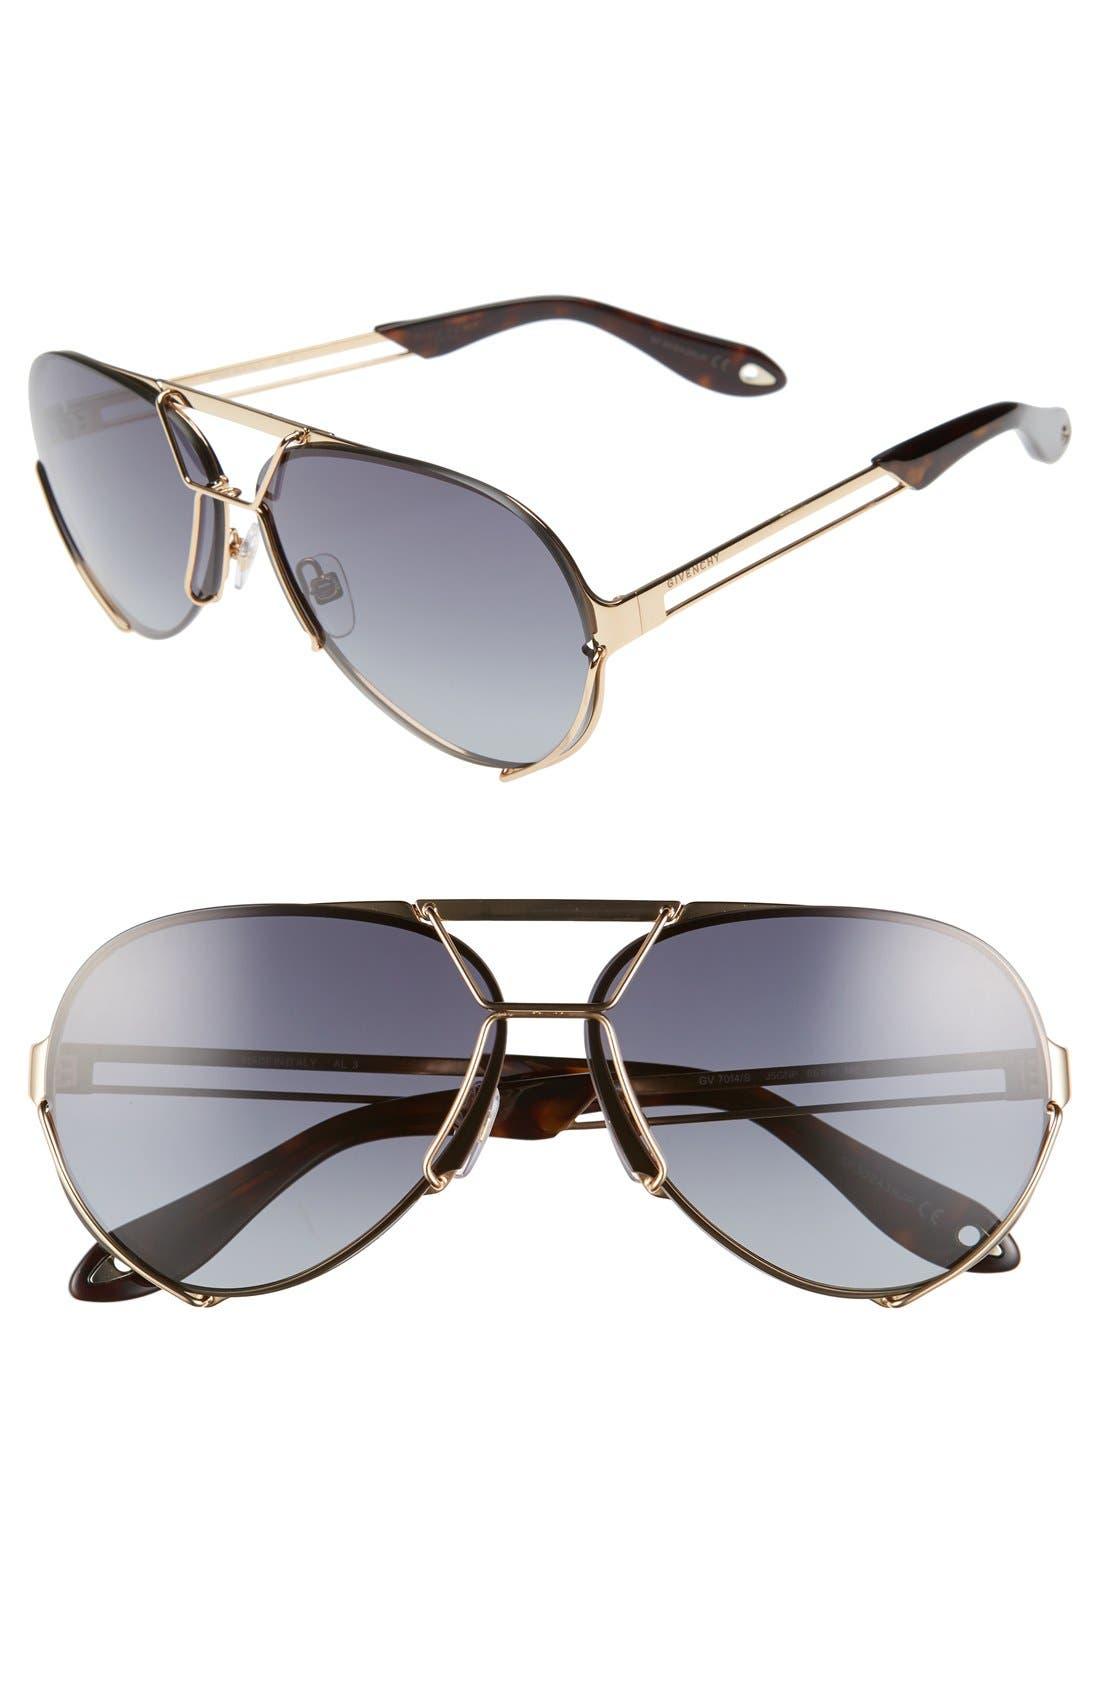 65mm Aviator Sunglasses,                             Main thumbnail 1, color,                             GOLD/ GREY